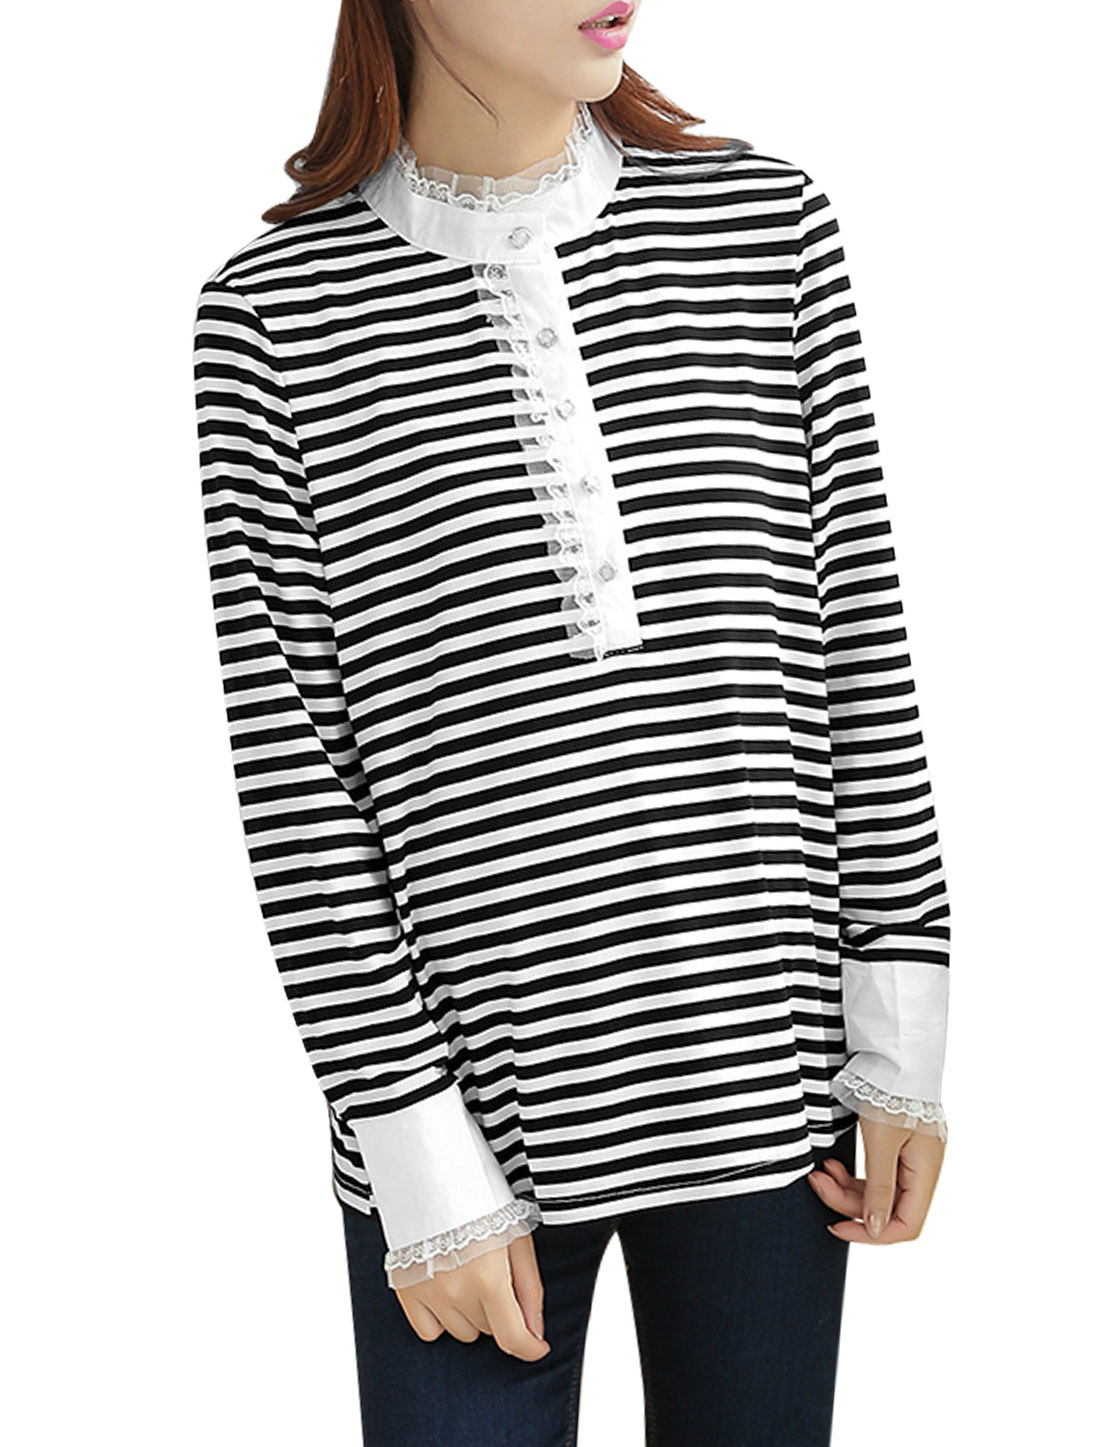 Maternity Button Cuffs 1/2 Placket Stripes Black White Casual Shirt M